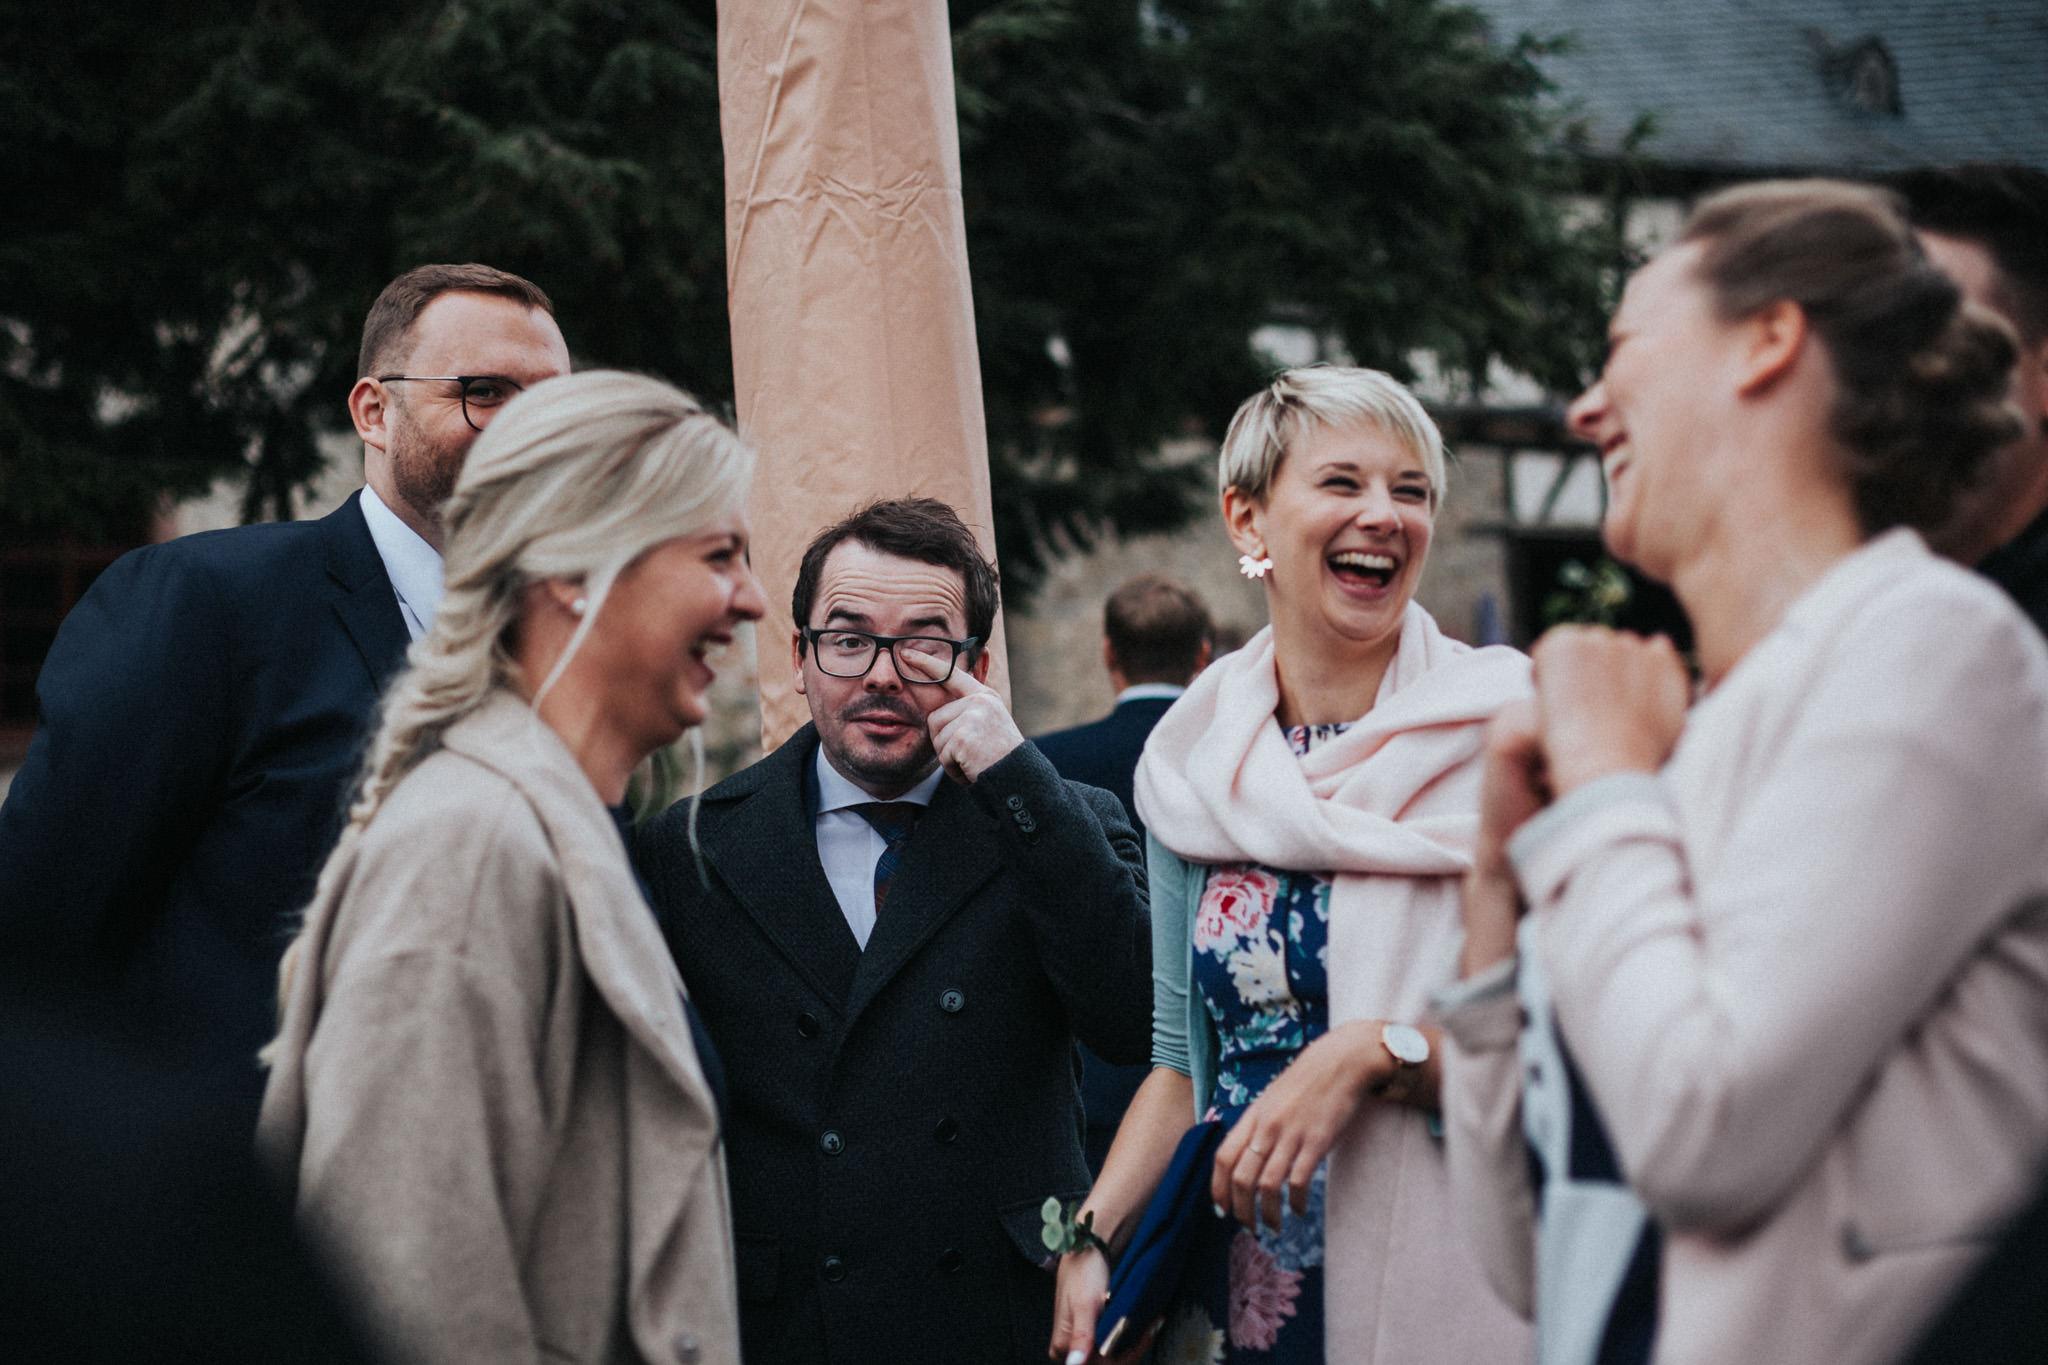 Hochzeitsfotograf-Homberg-48.jpg